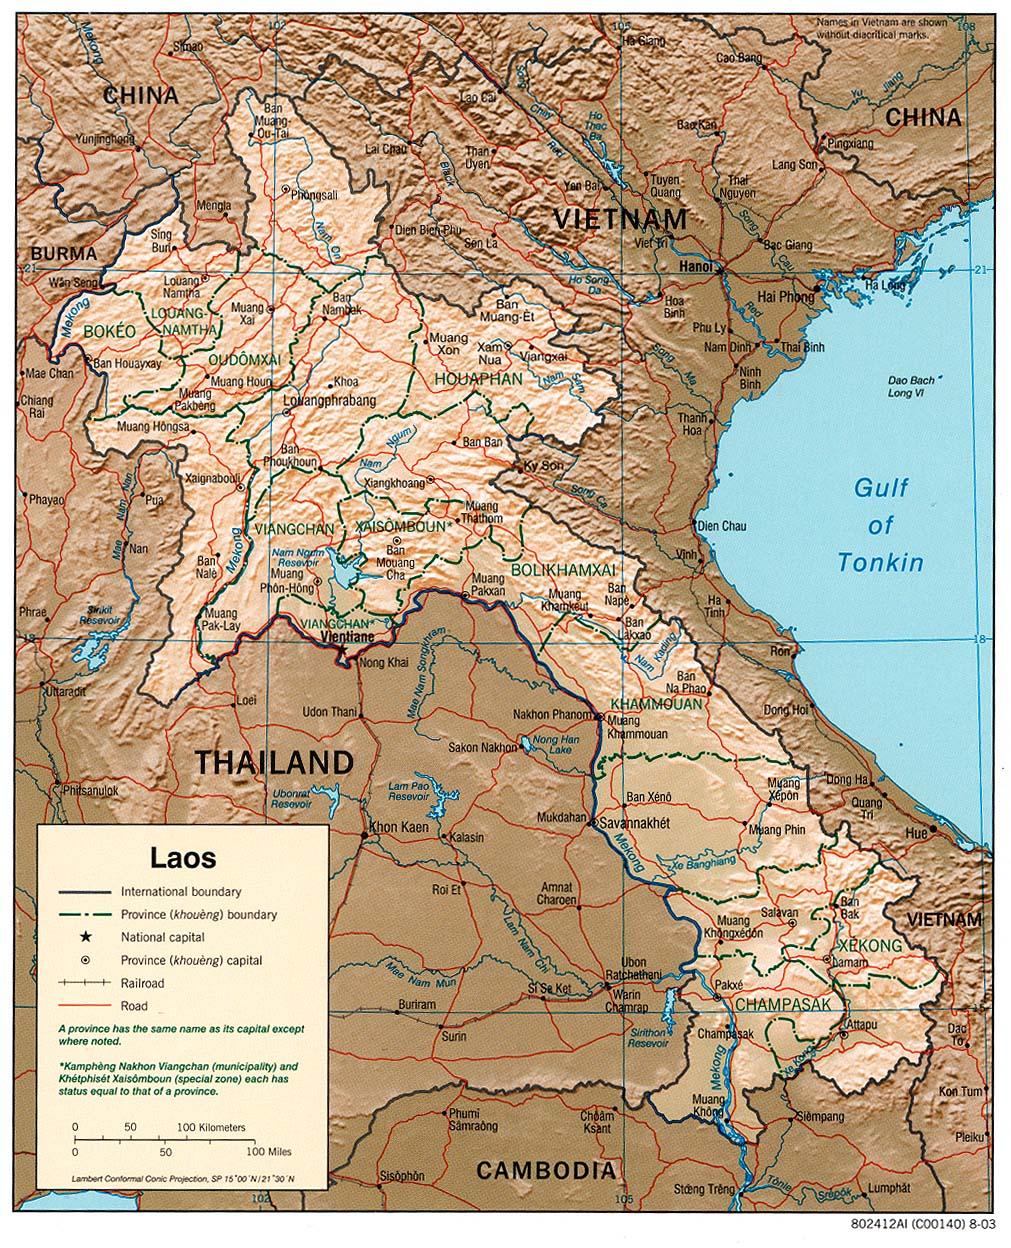 Mapa de Relieve Sombreado de Laos